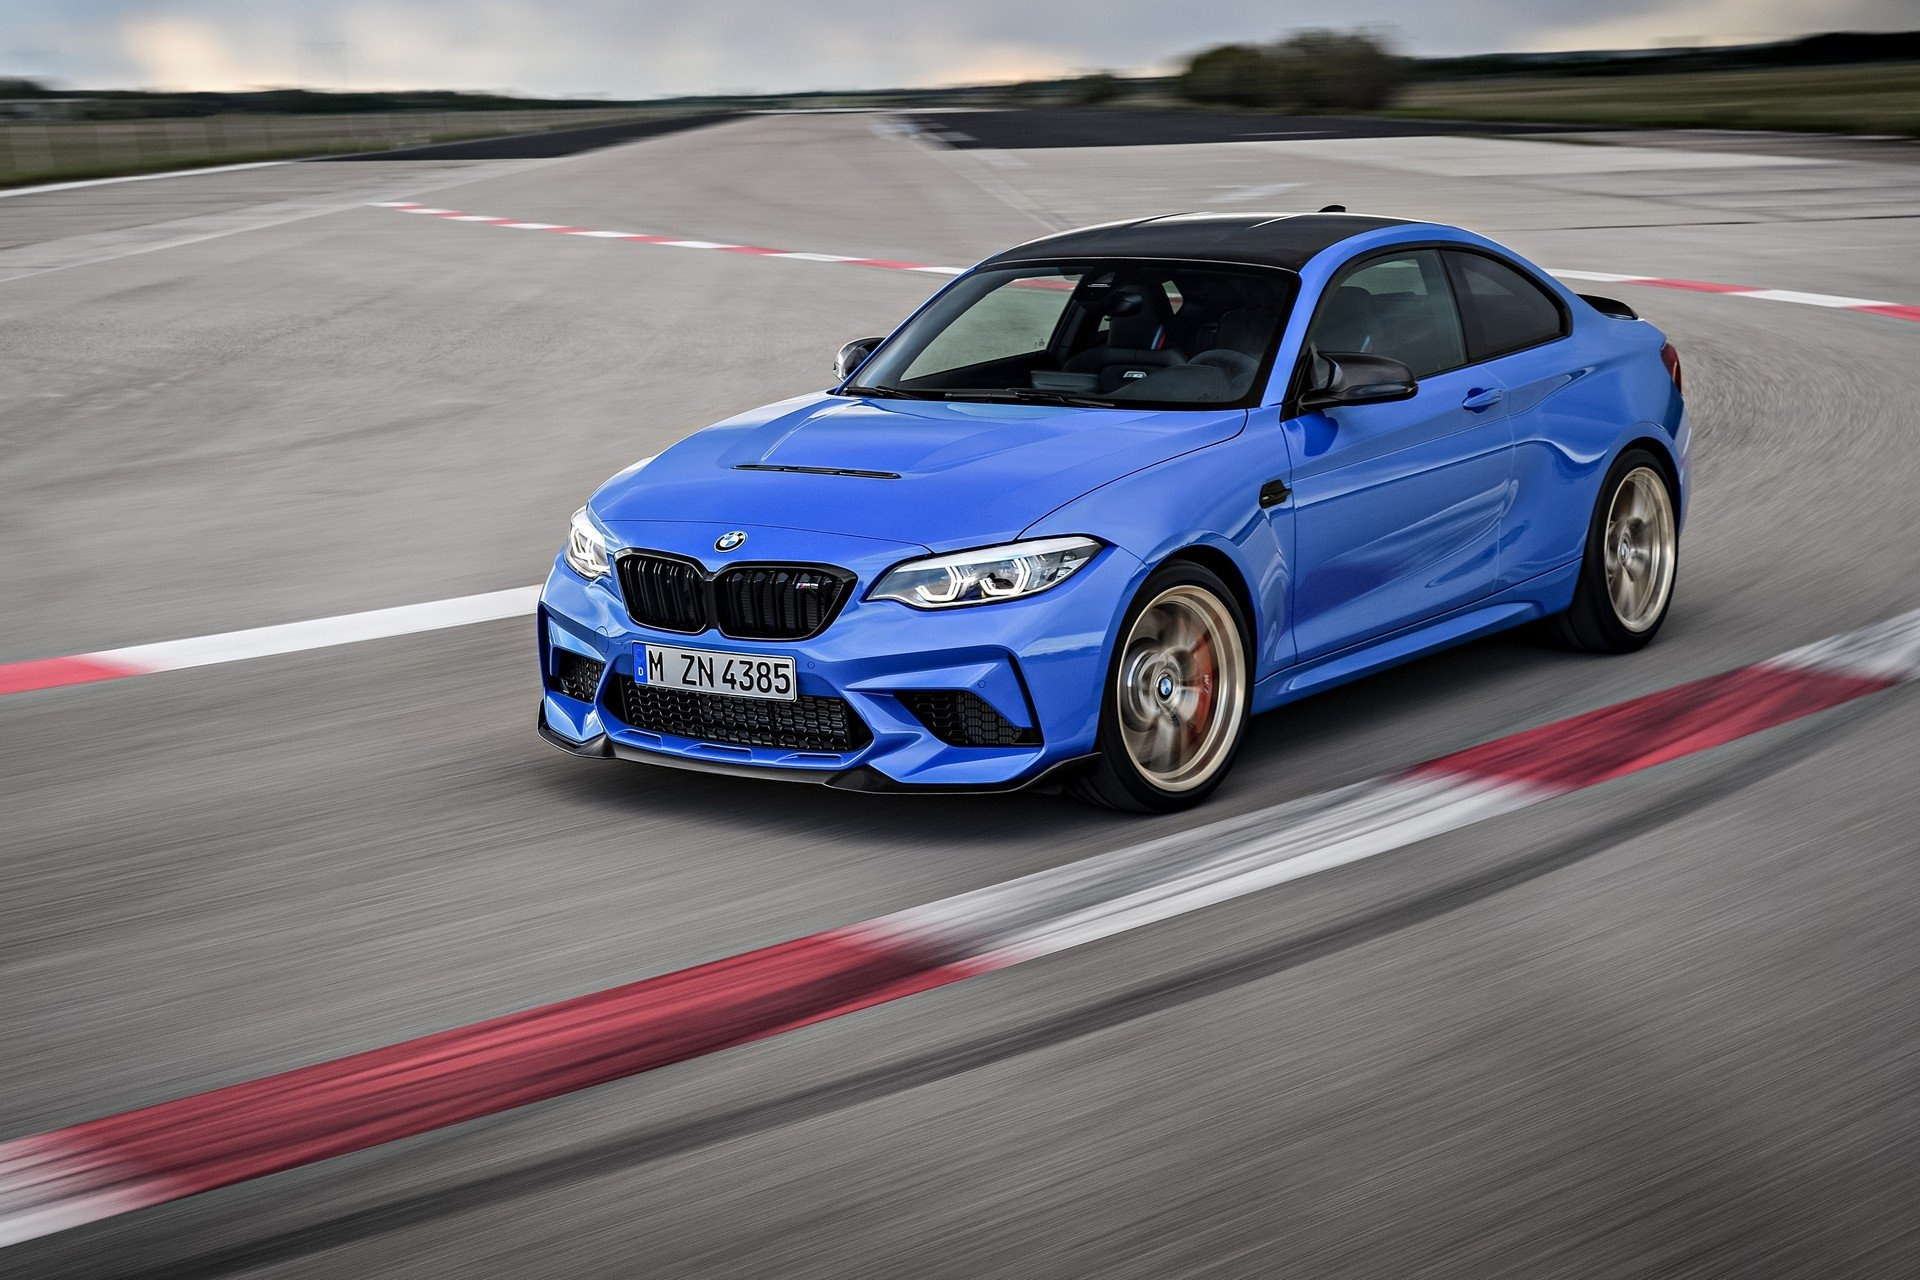 Chiem nguong BMW M2 C2 2020 anh 3